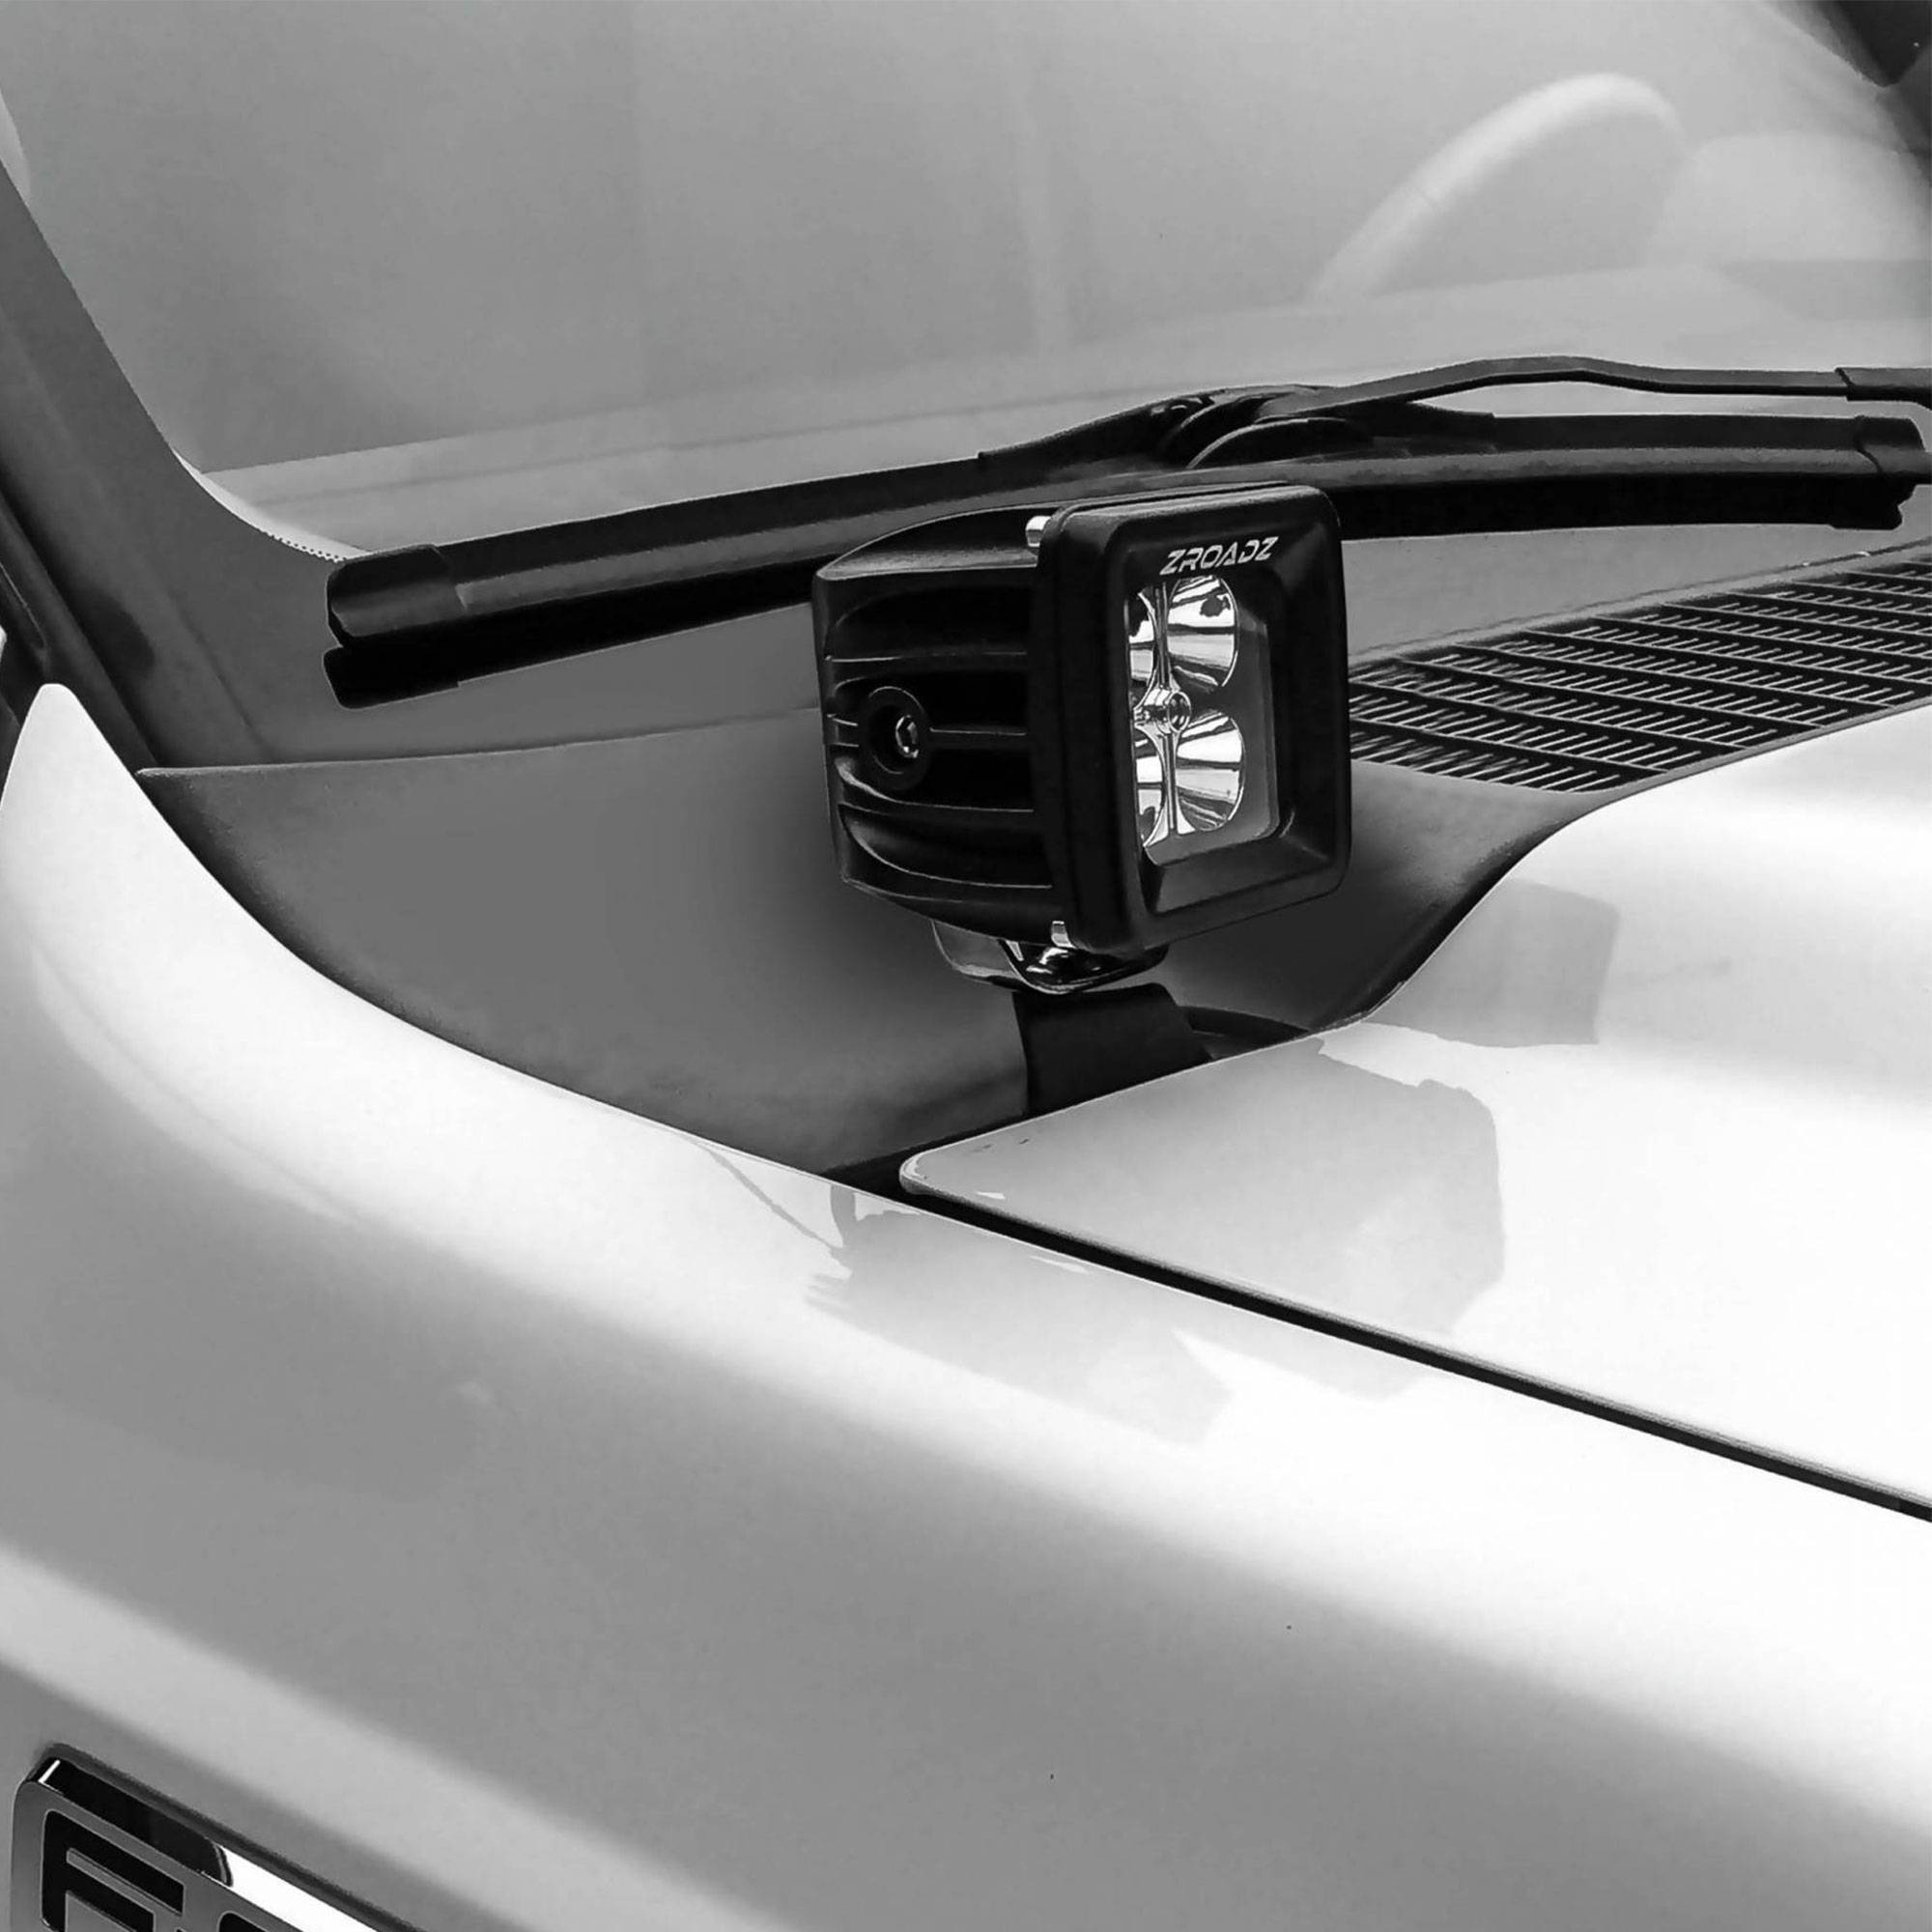 ZROADZ OFF ROAD PRODUCTS - 2011-2016 Ford Super Duty Hood Hinge LED Bracket to mount (2) 3 Inch LED Pod Lights - PN #Z365461